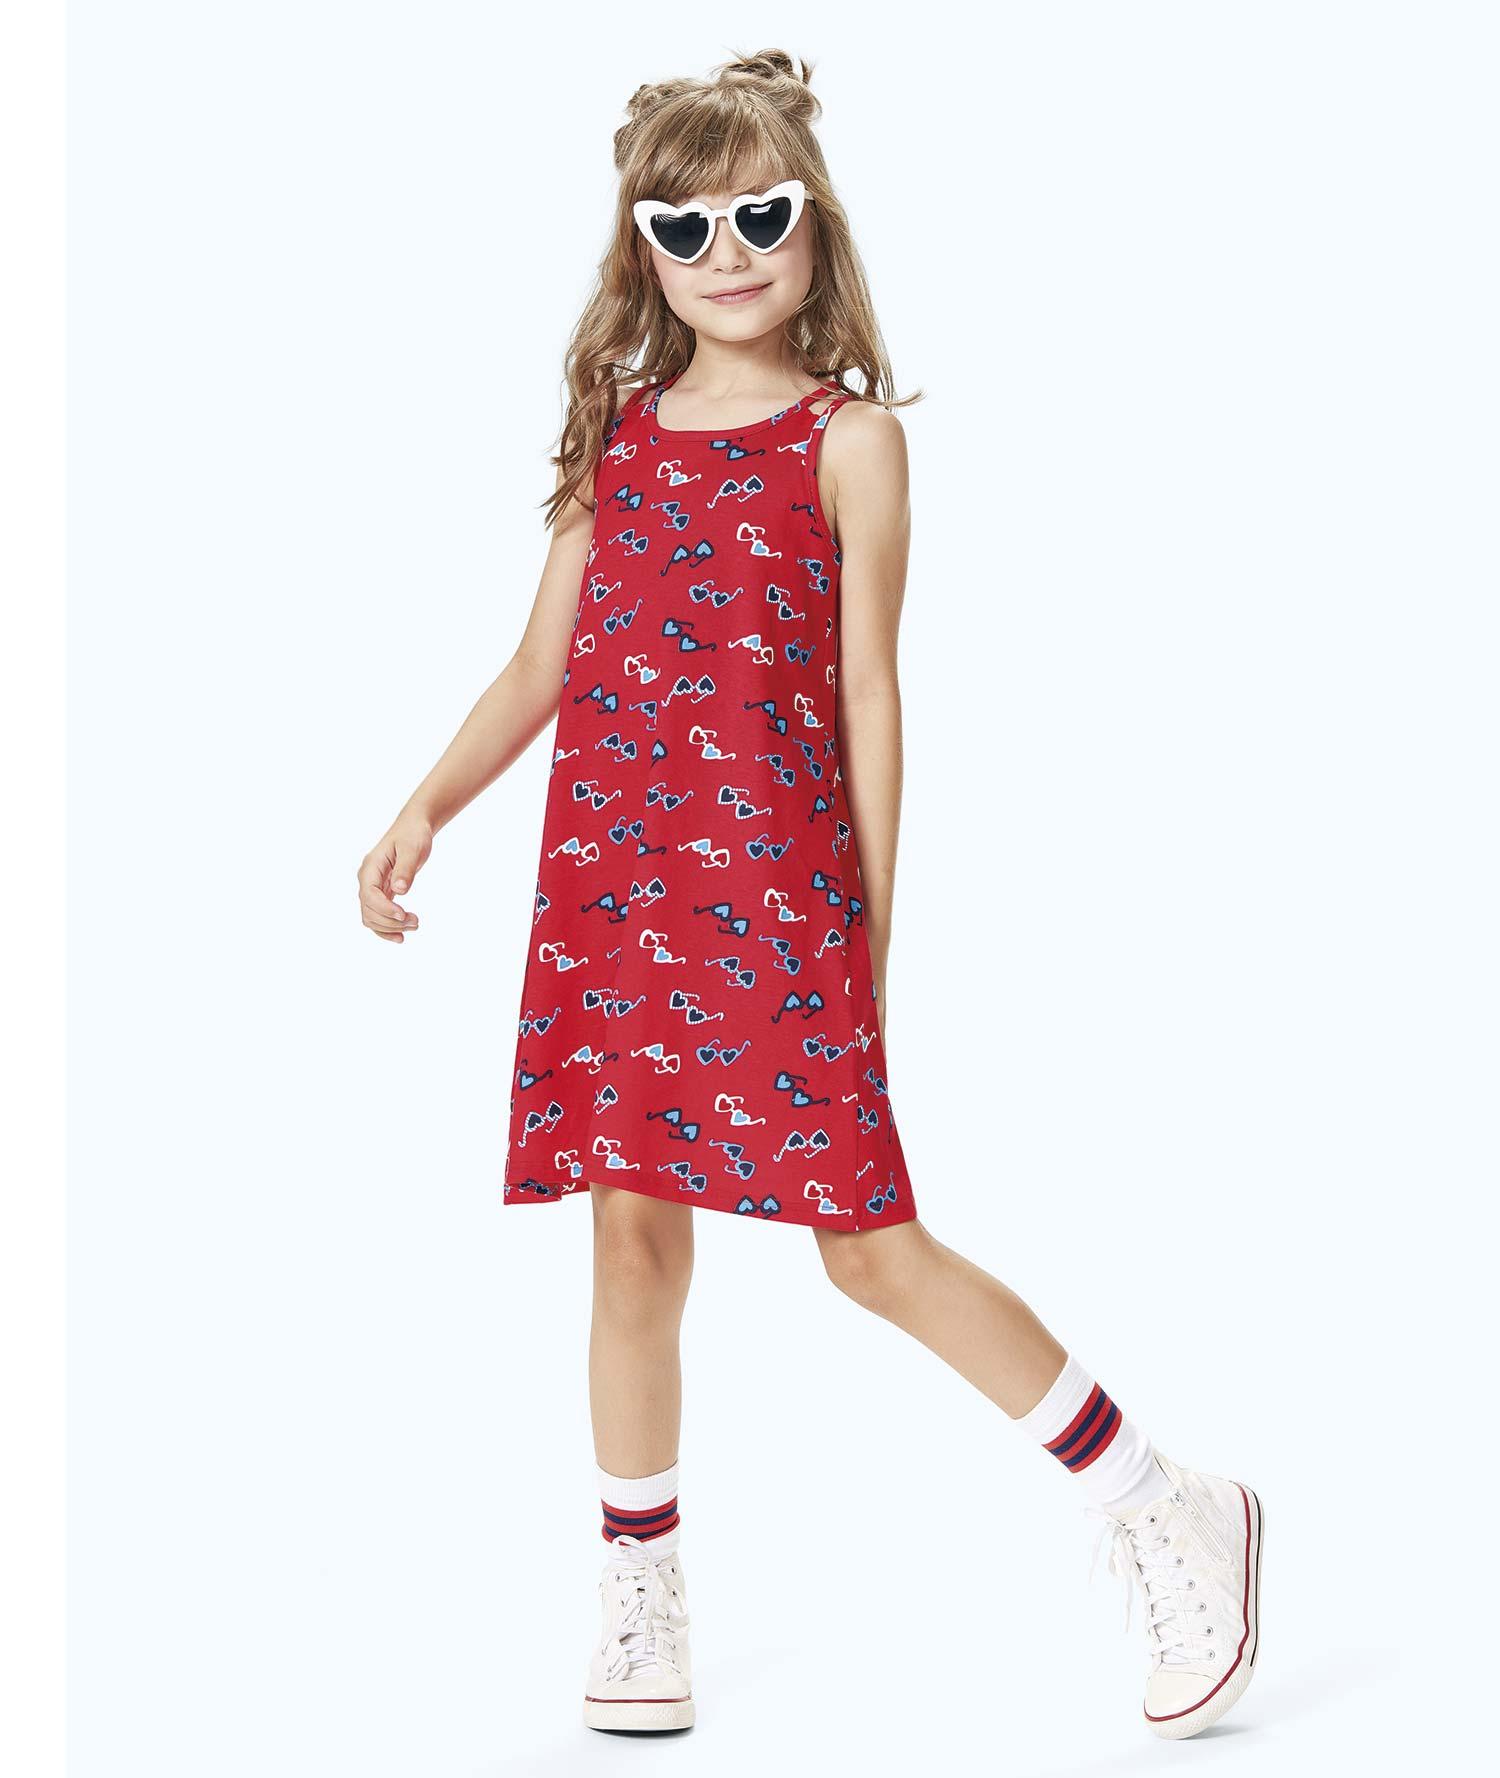 Vestido Infantil Verão Vermelho Glasses Malwee